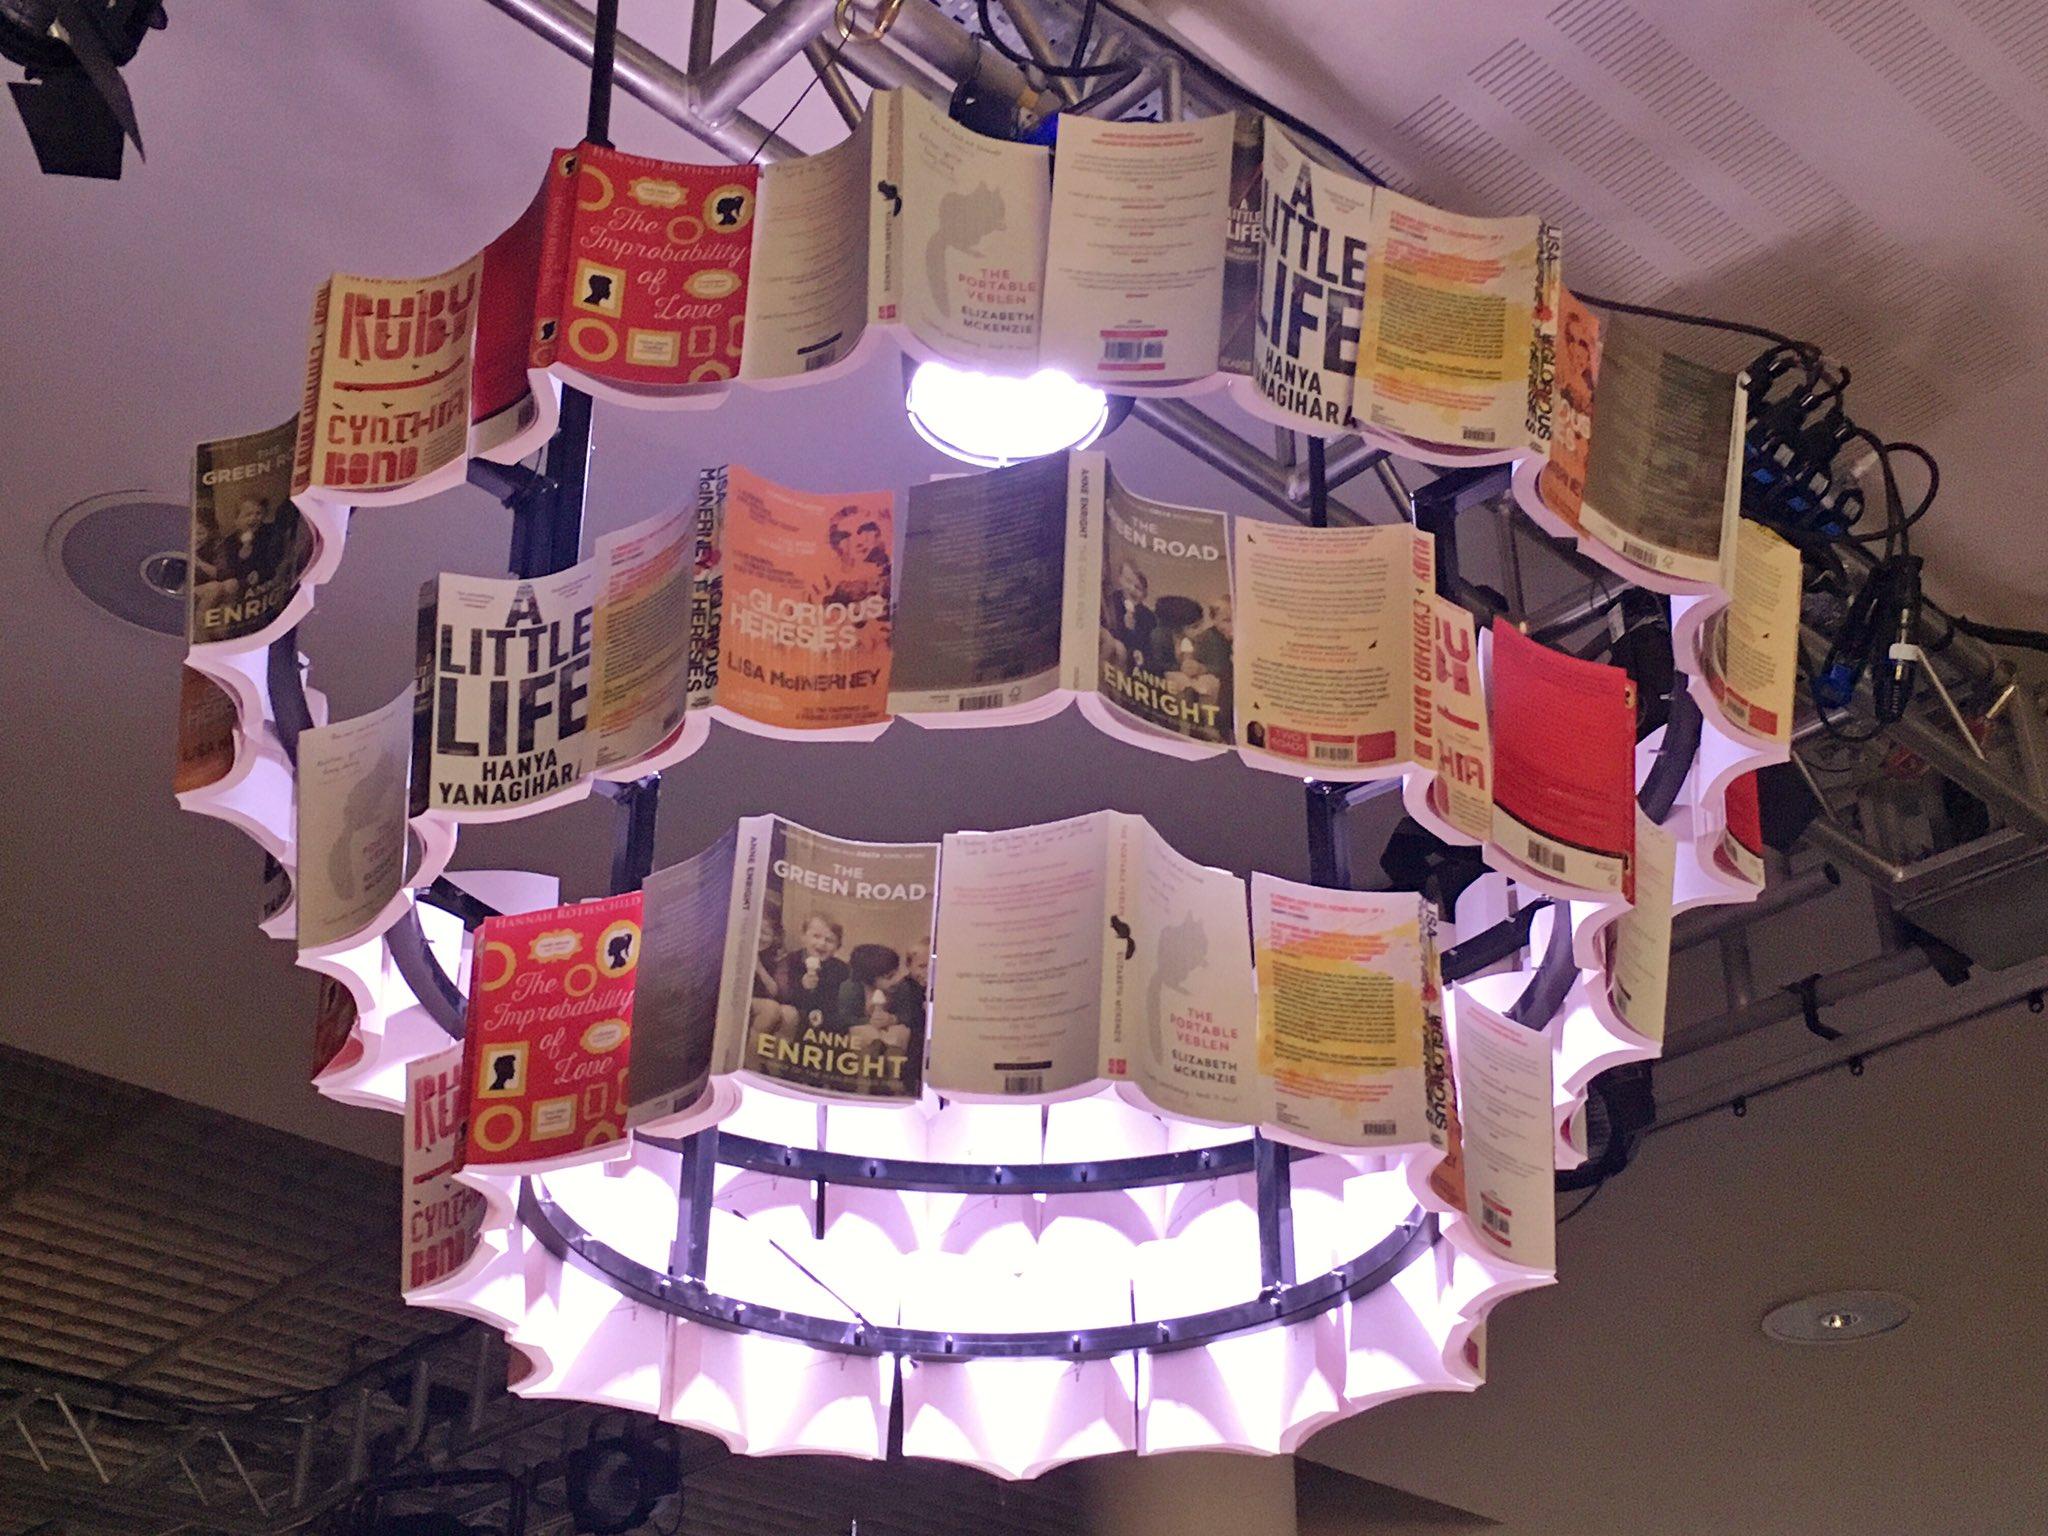 book chandeliers featuring the 2016 #BaileysPrize shortlist!